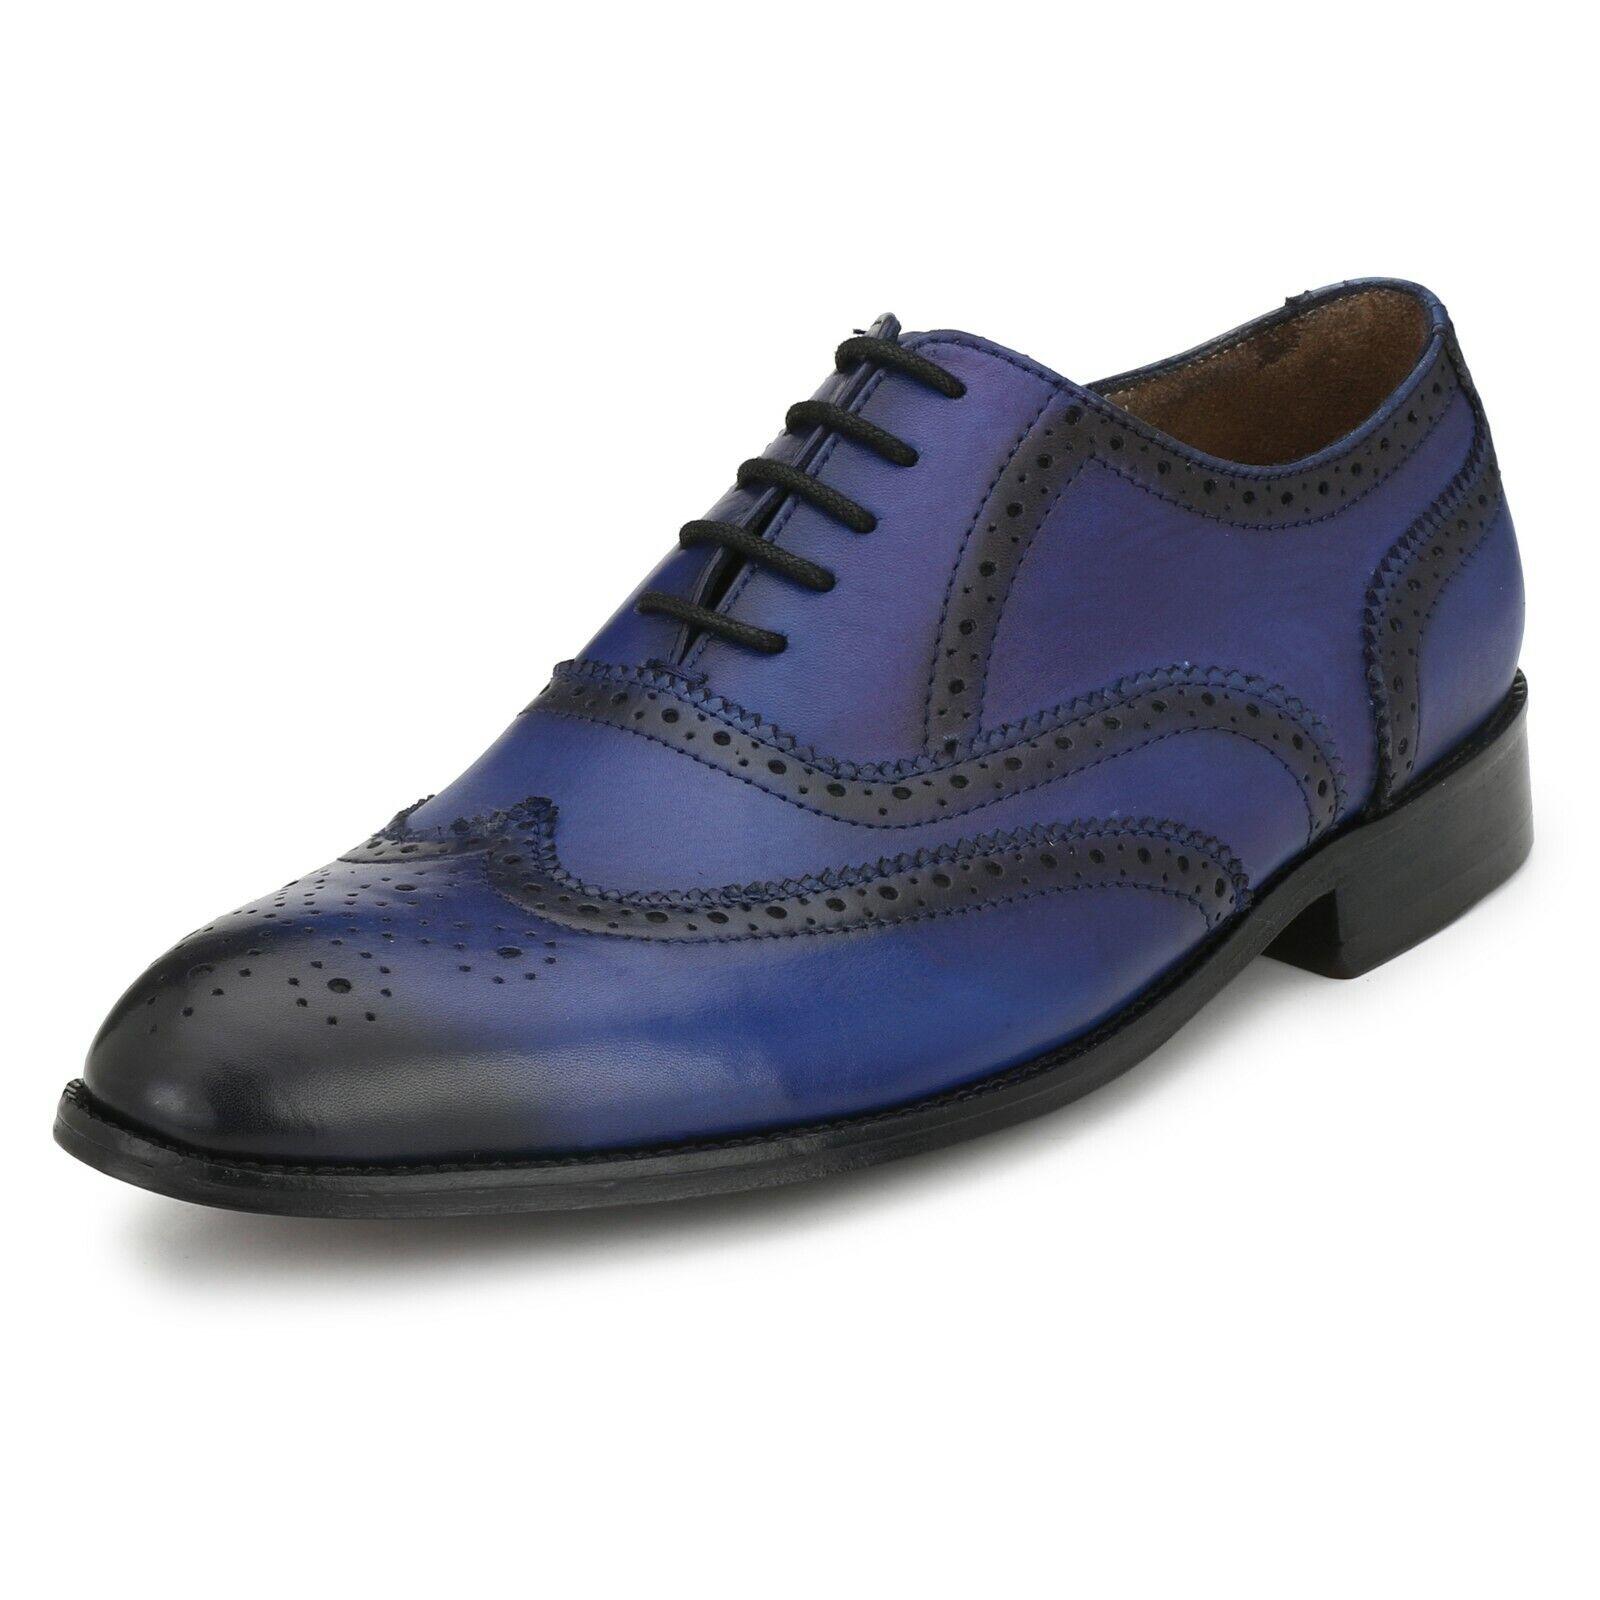 Kingkomfort Hand Crafted Leather Camden(KK011) Formal Business Dress shoes